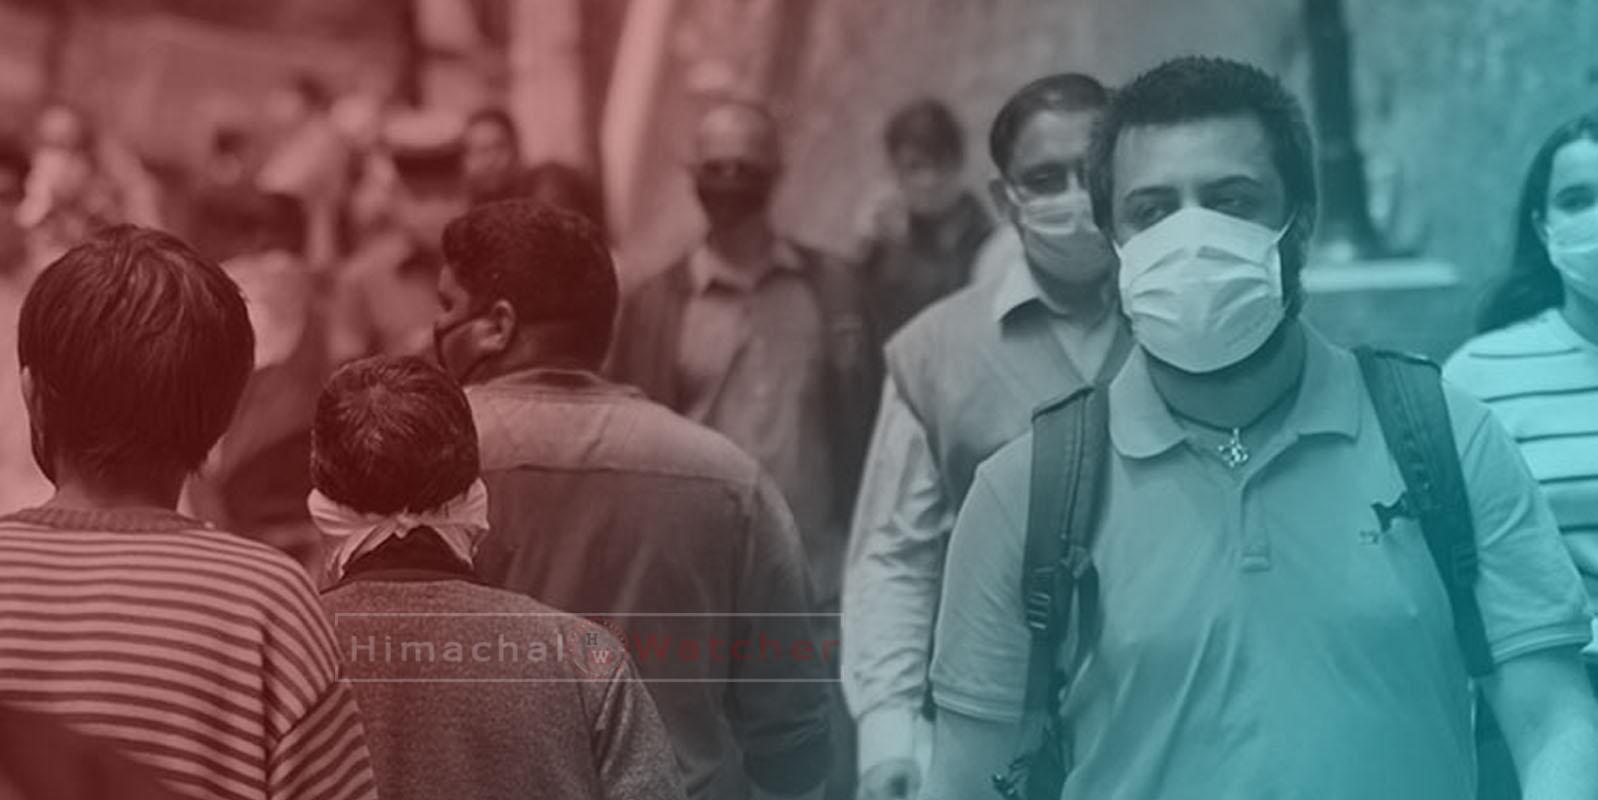 Himachal Pradesh 1000 cOVID-19 cases